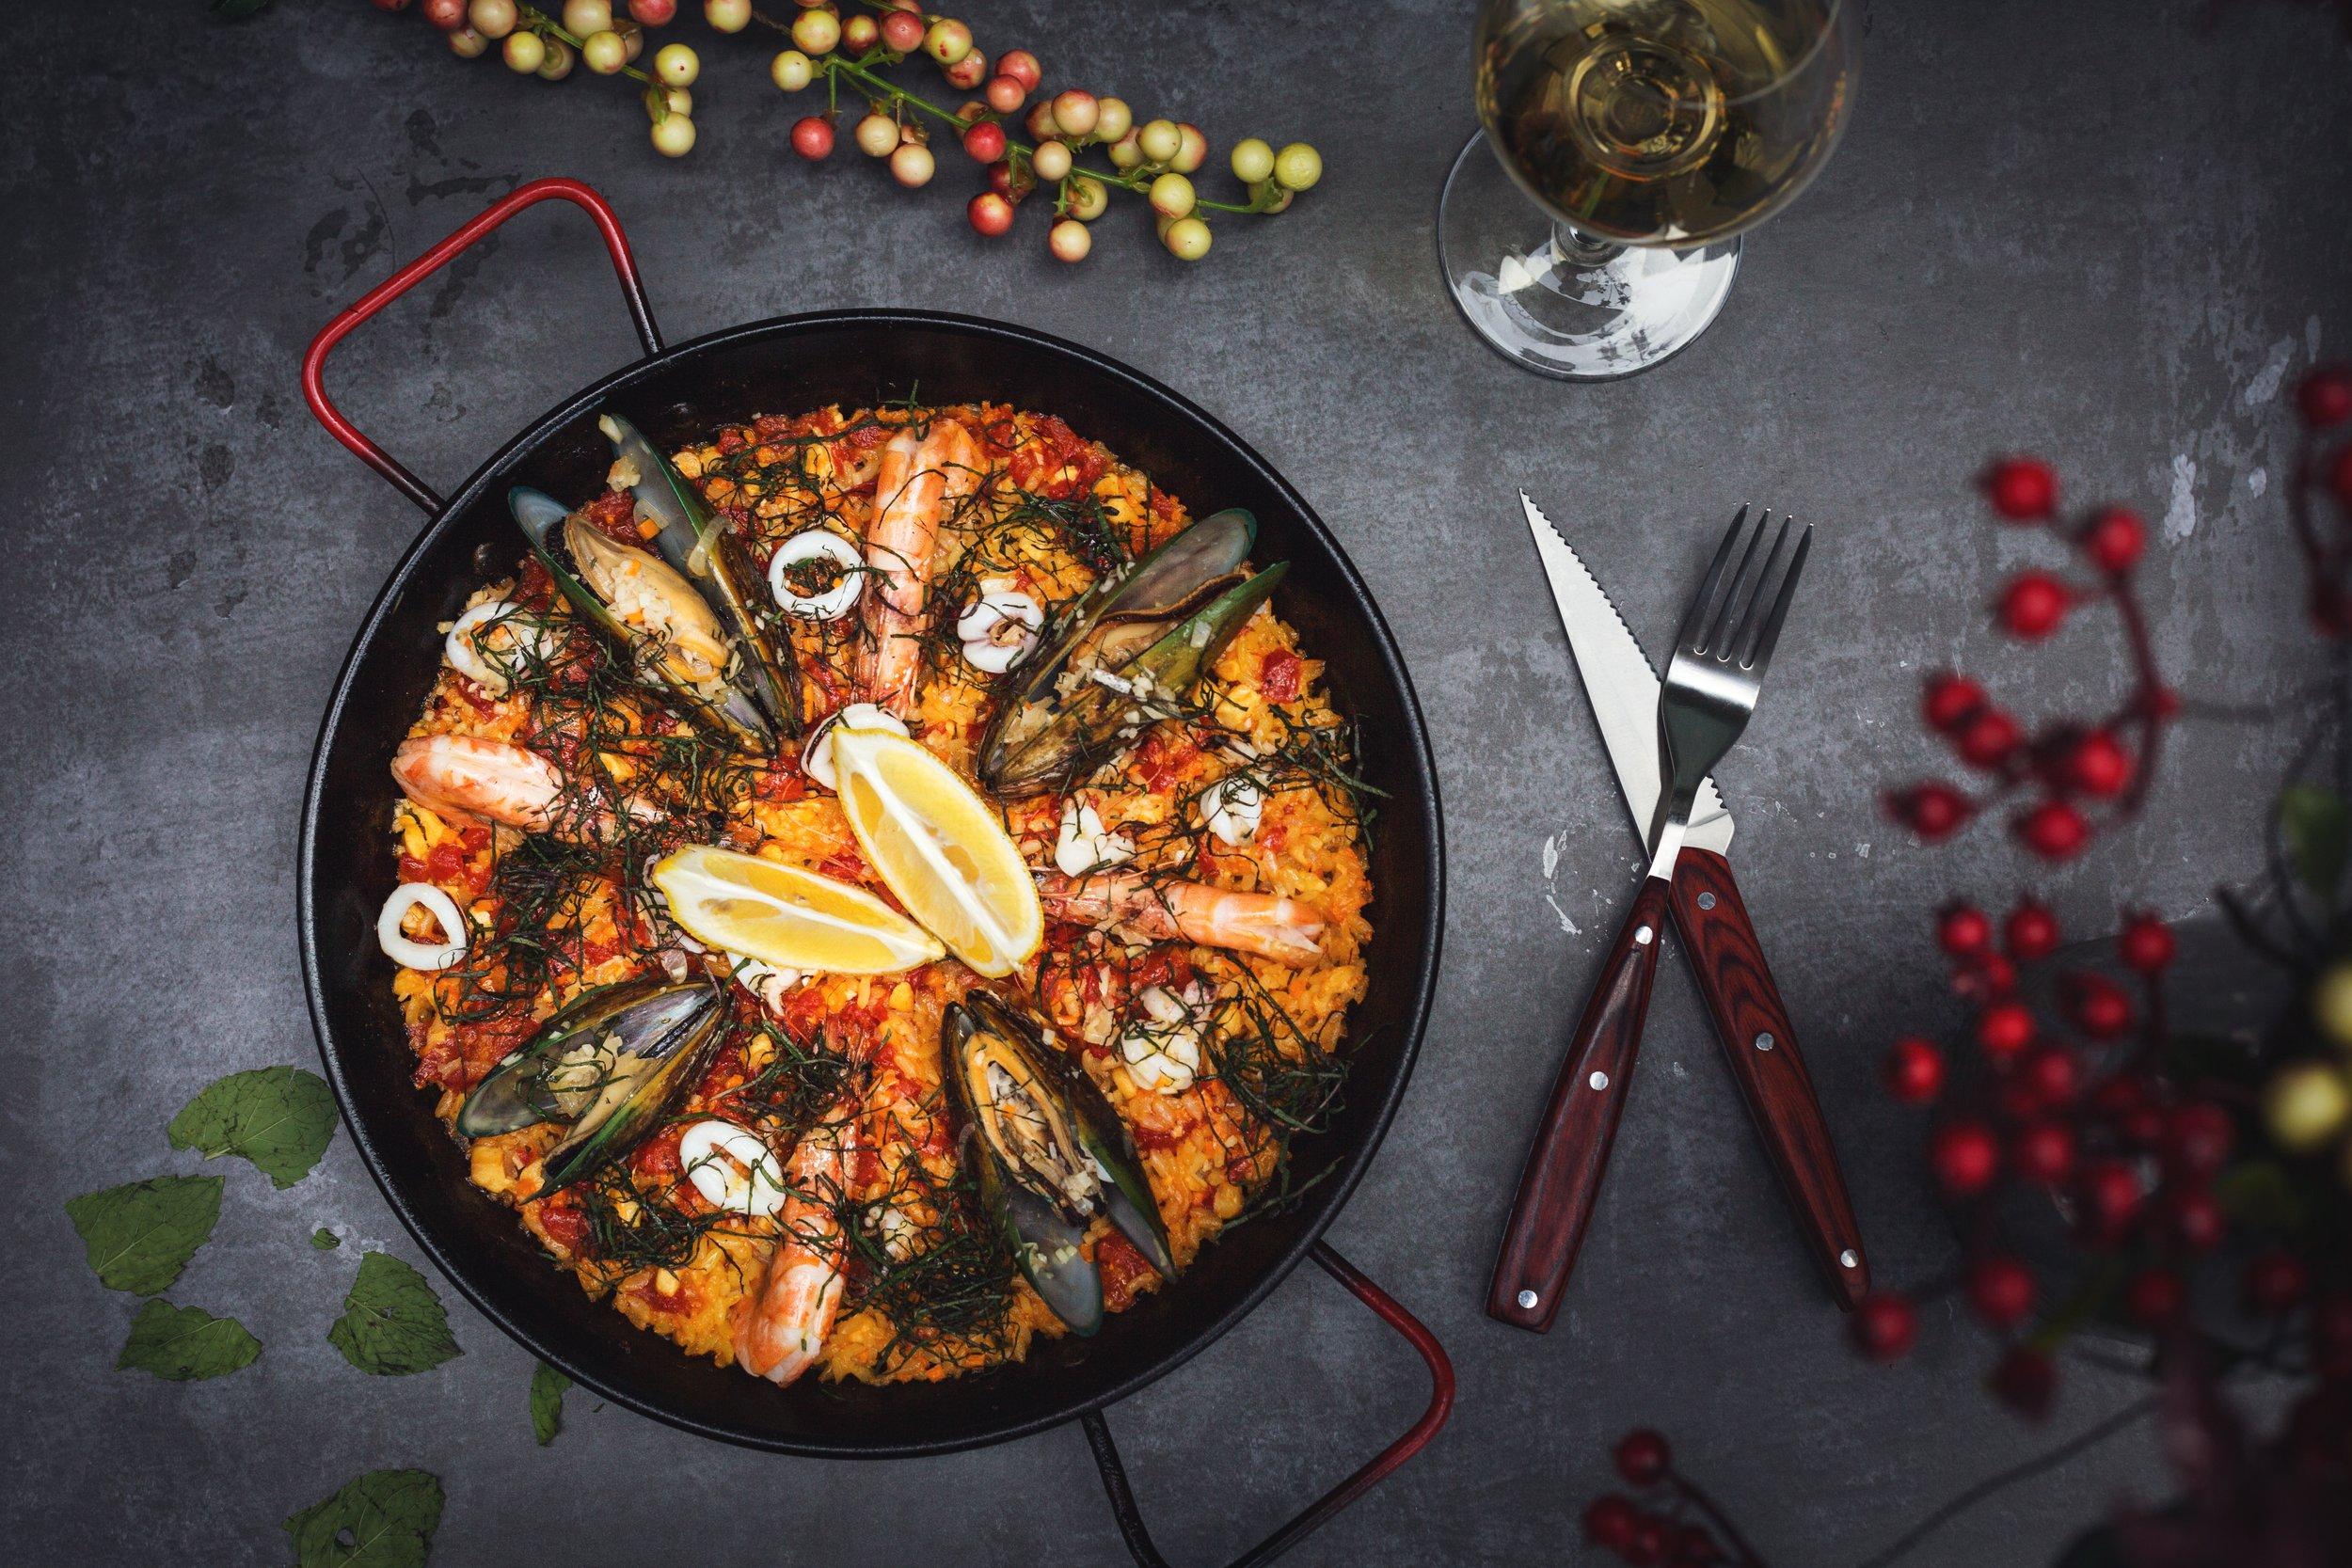 - paella and tapas